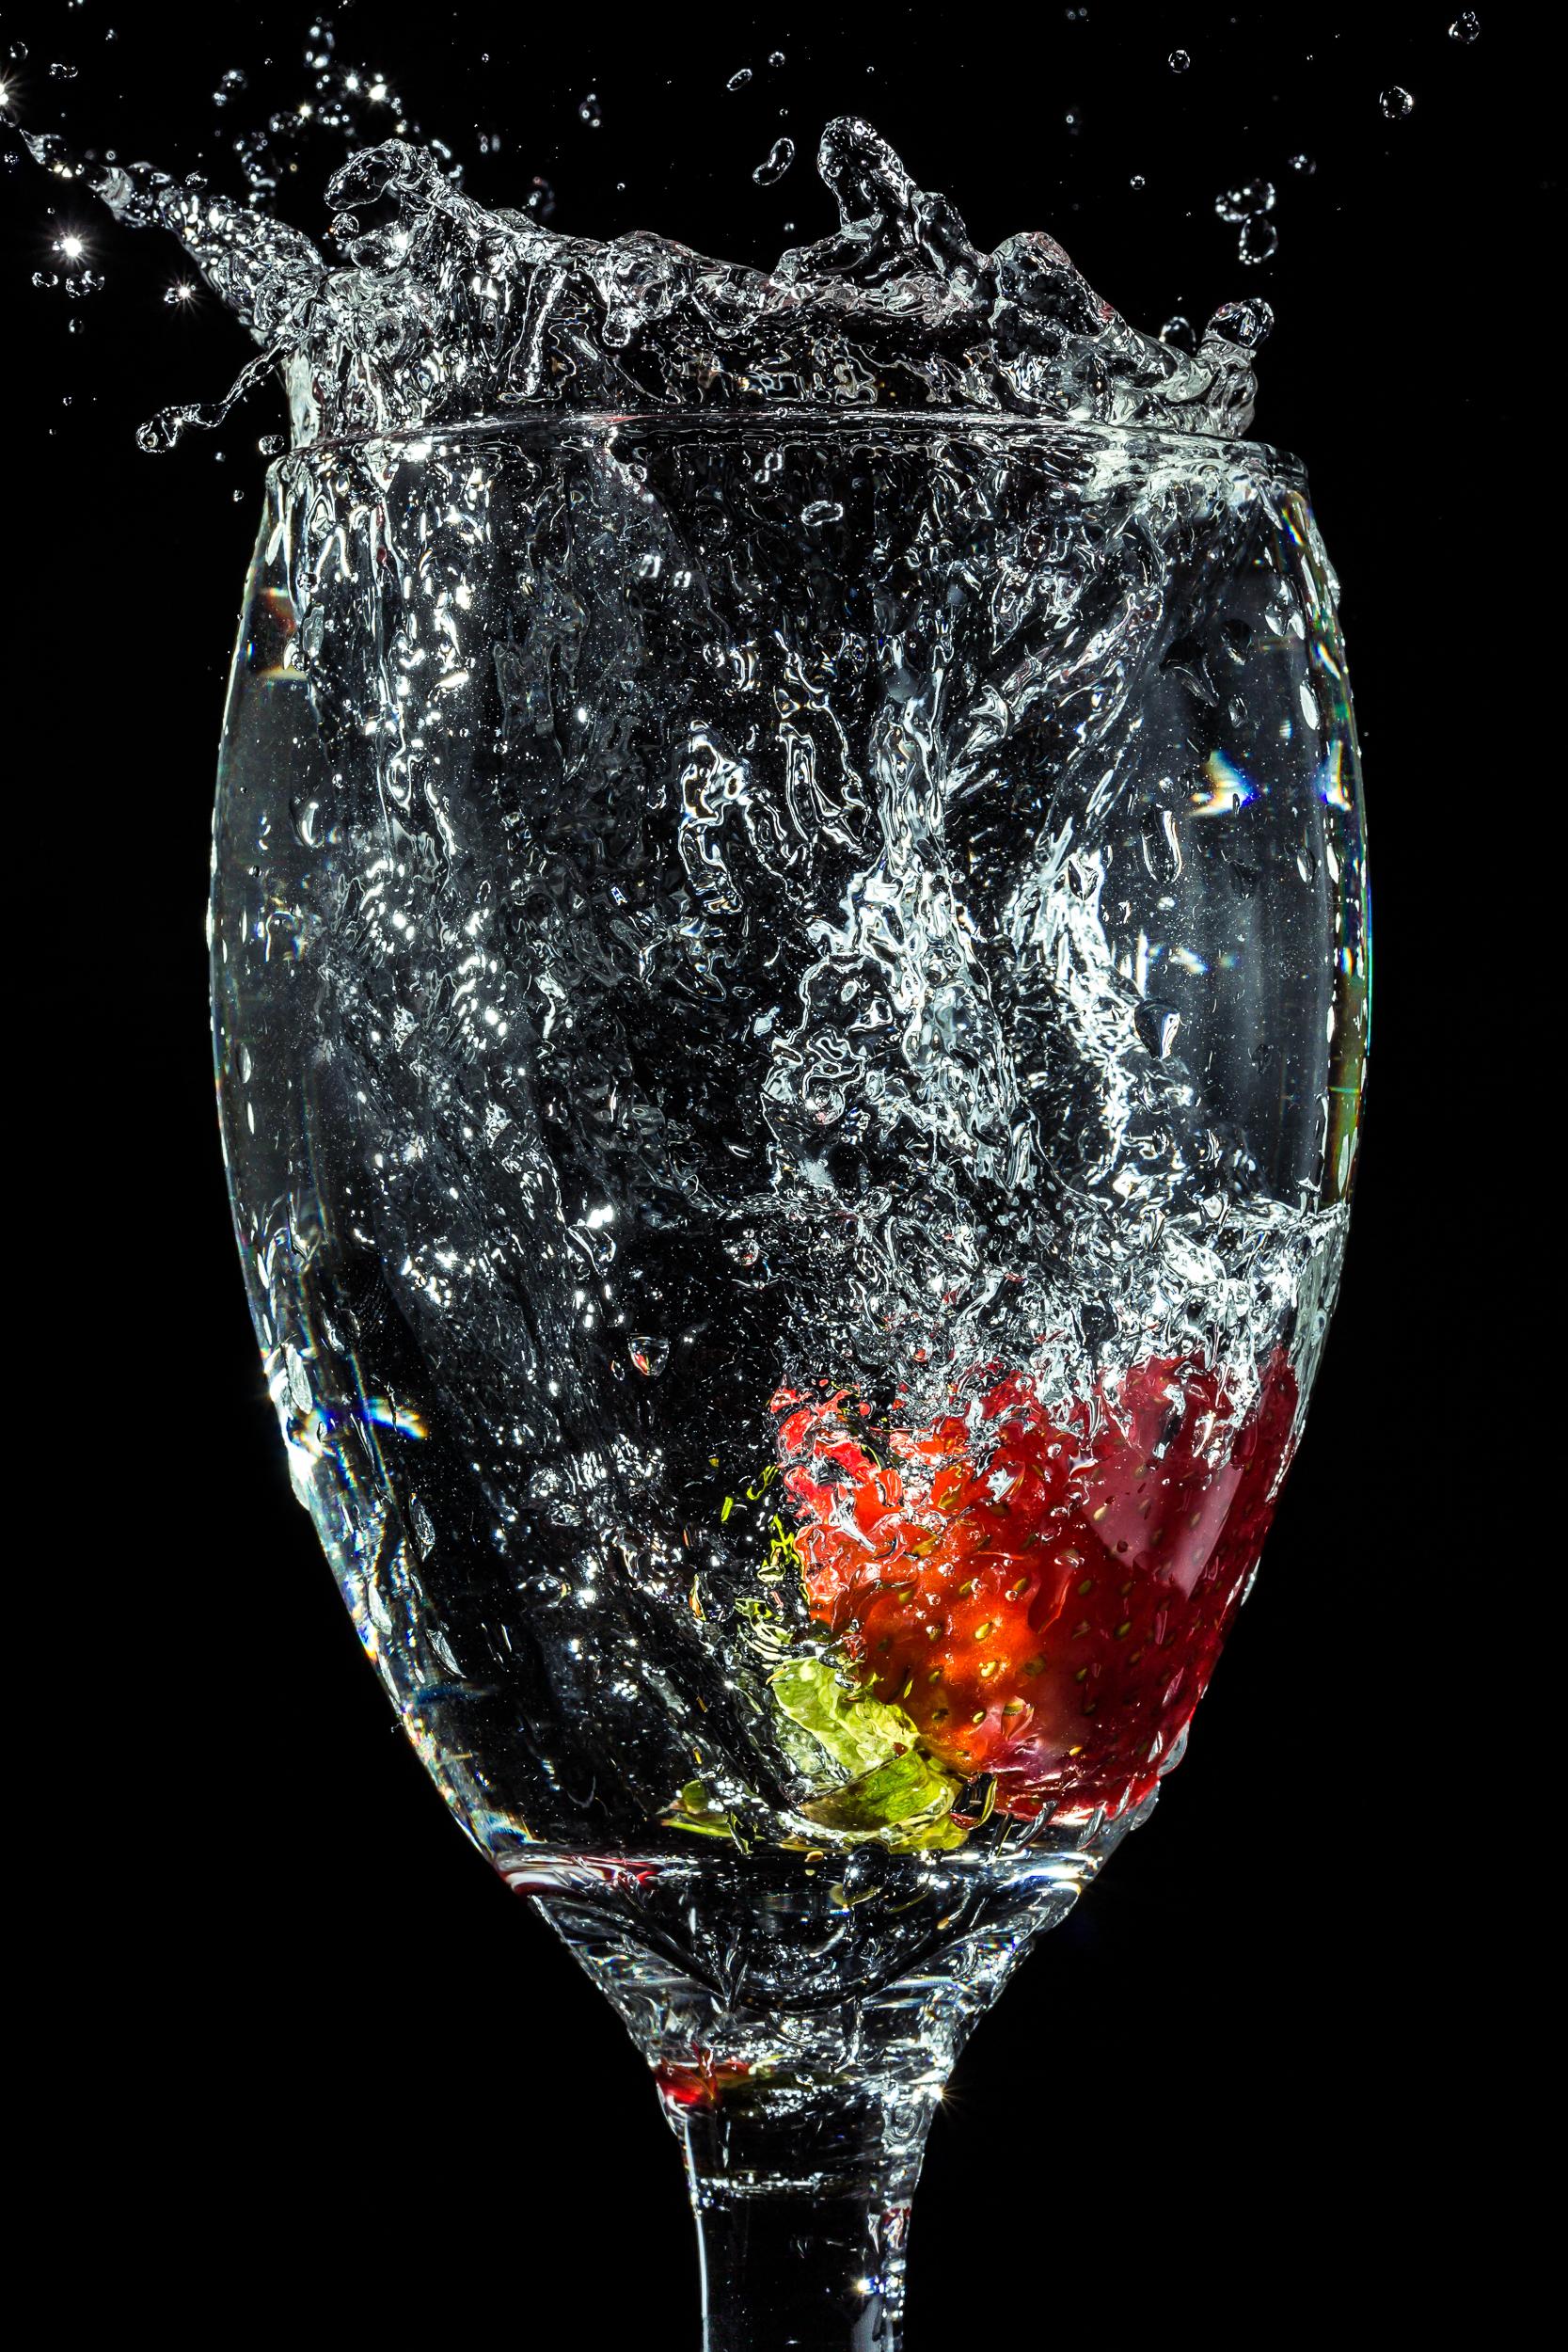 flash-freeze-fruit-2.jpg